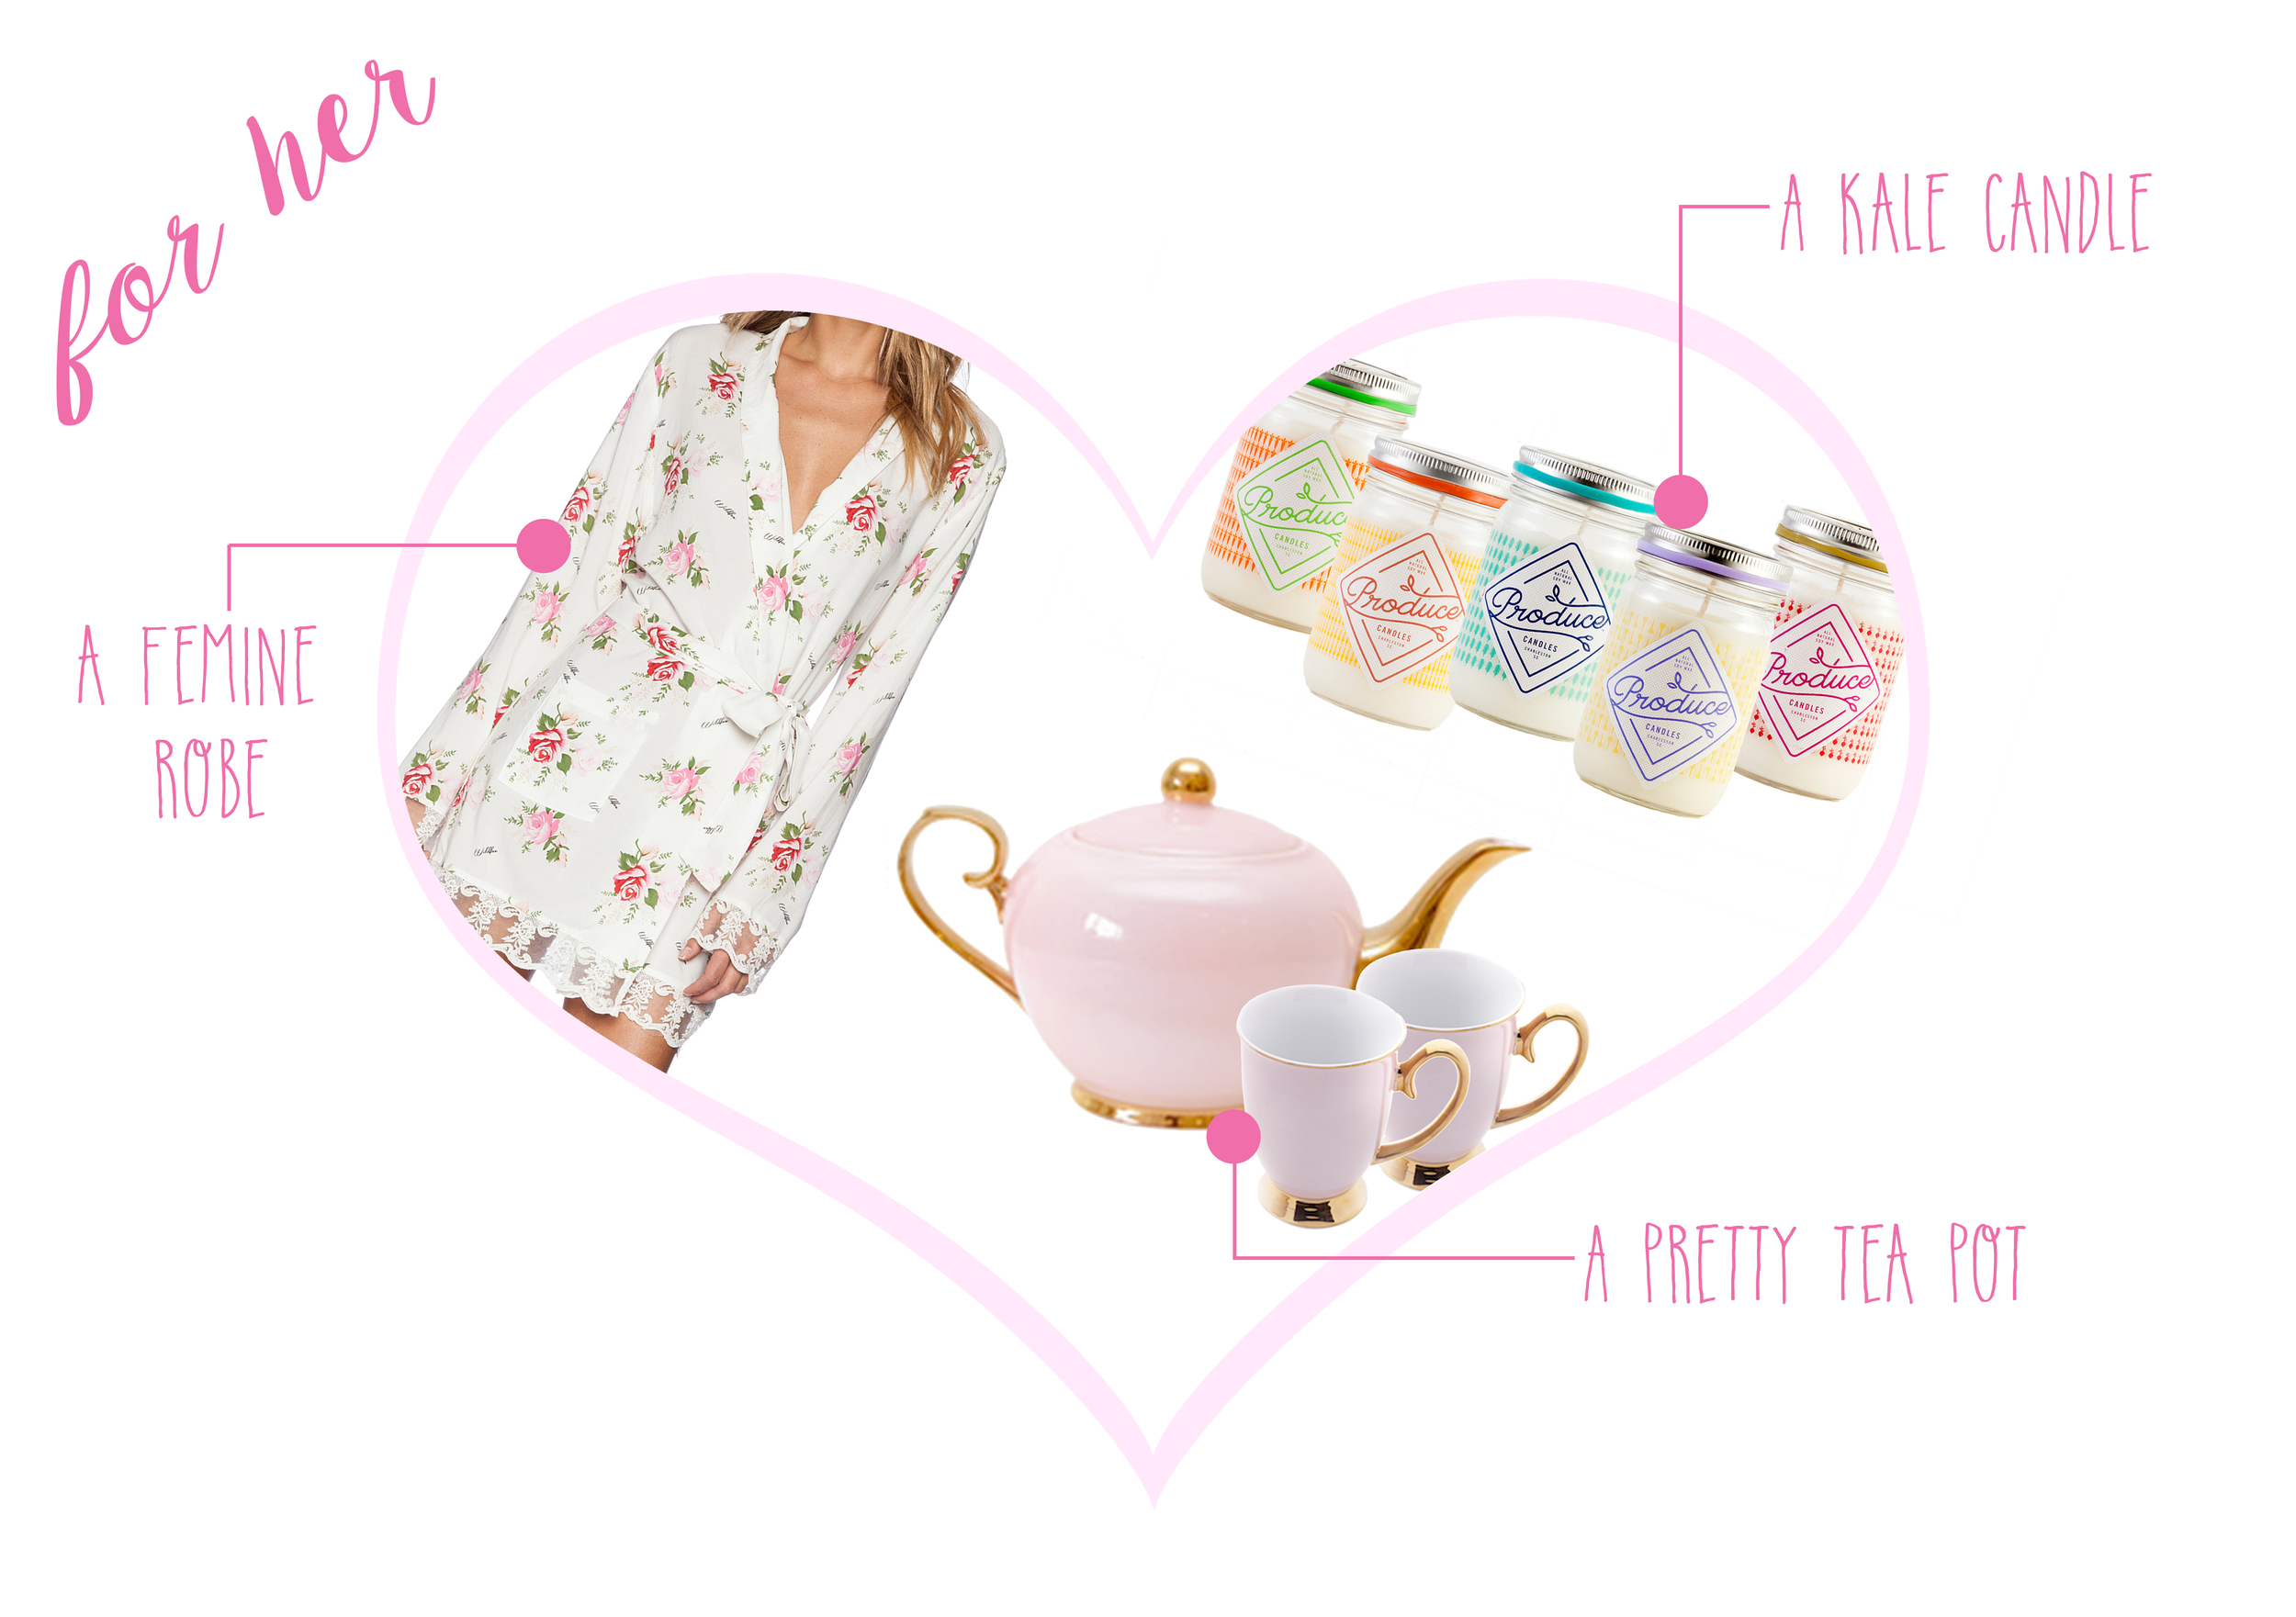 Wildfox Lace Robe  ($138) -  High Tea Pot   & Teacups  ($50 & $15) -  Produce Candles  ($20)